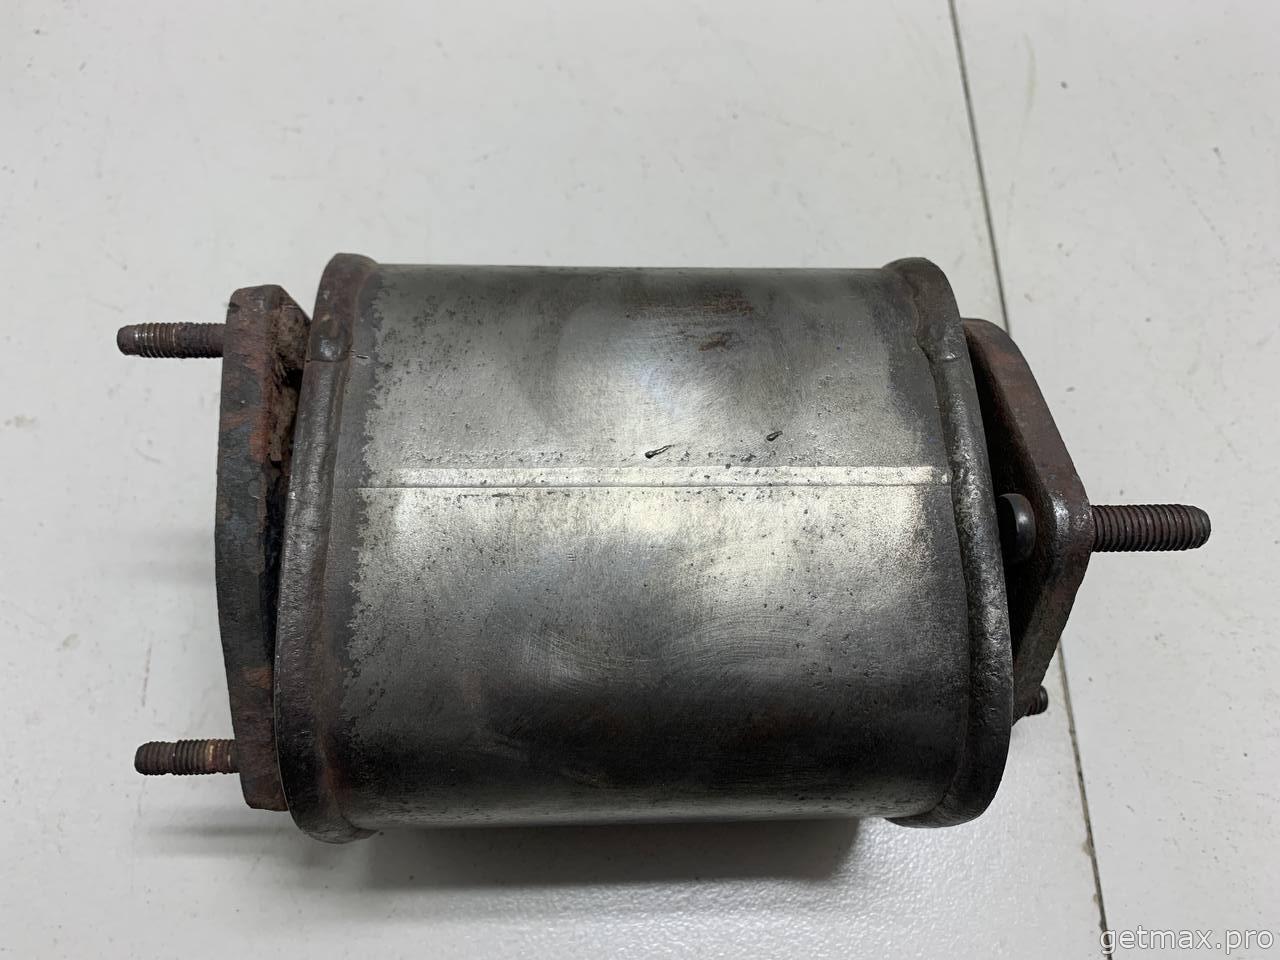 Катализатор (бу) Chevrolet Lacetti 2003-2013 купить